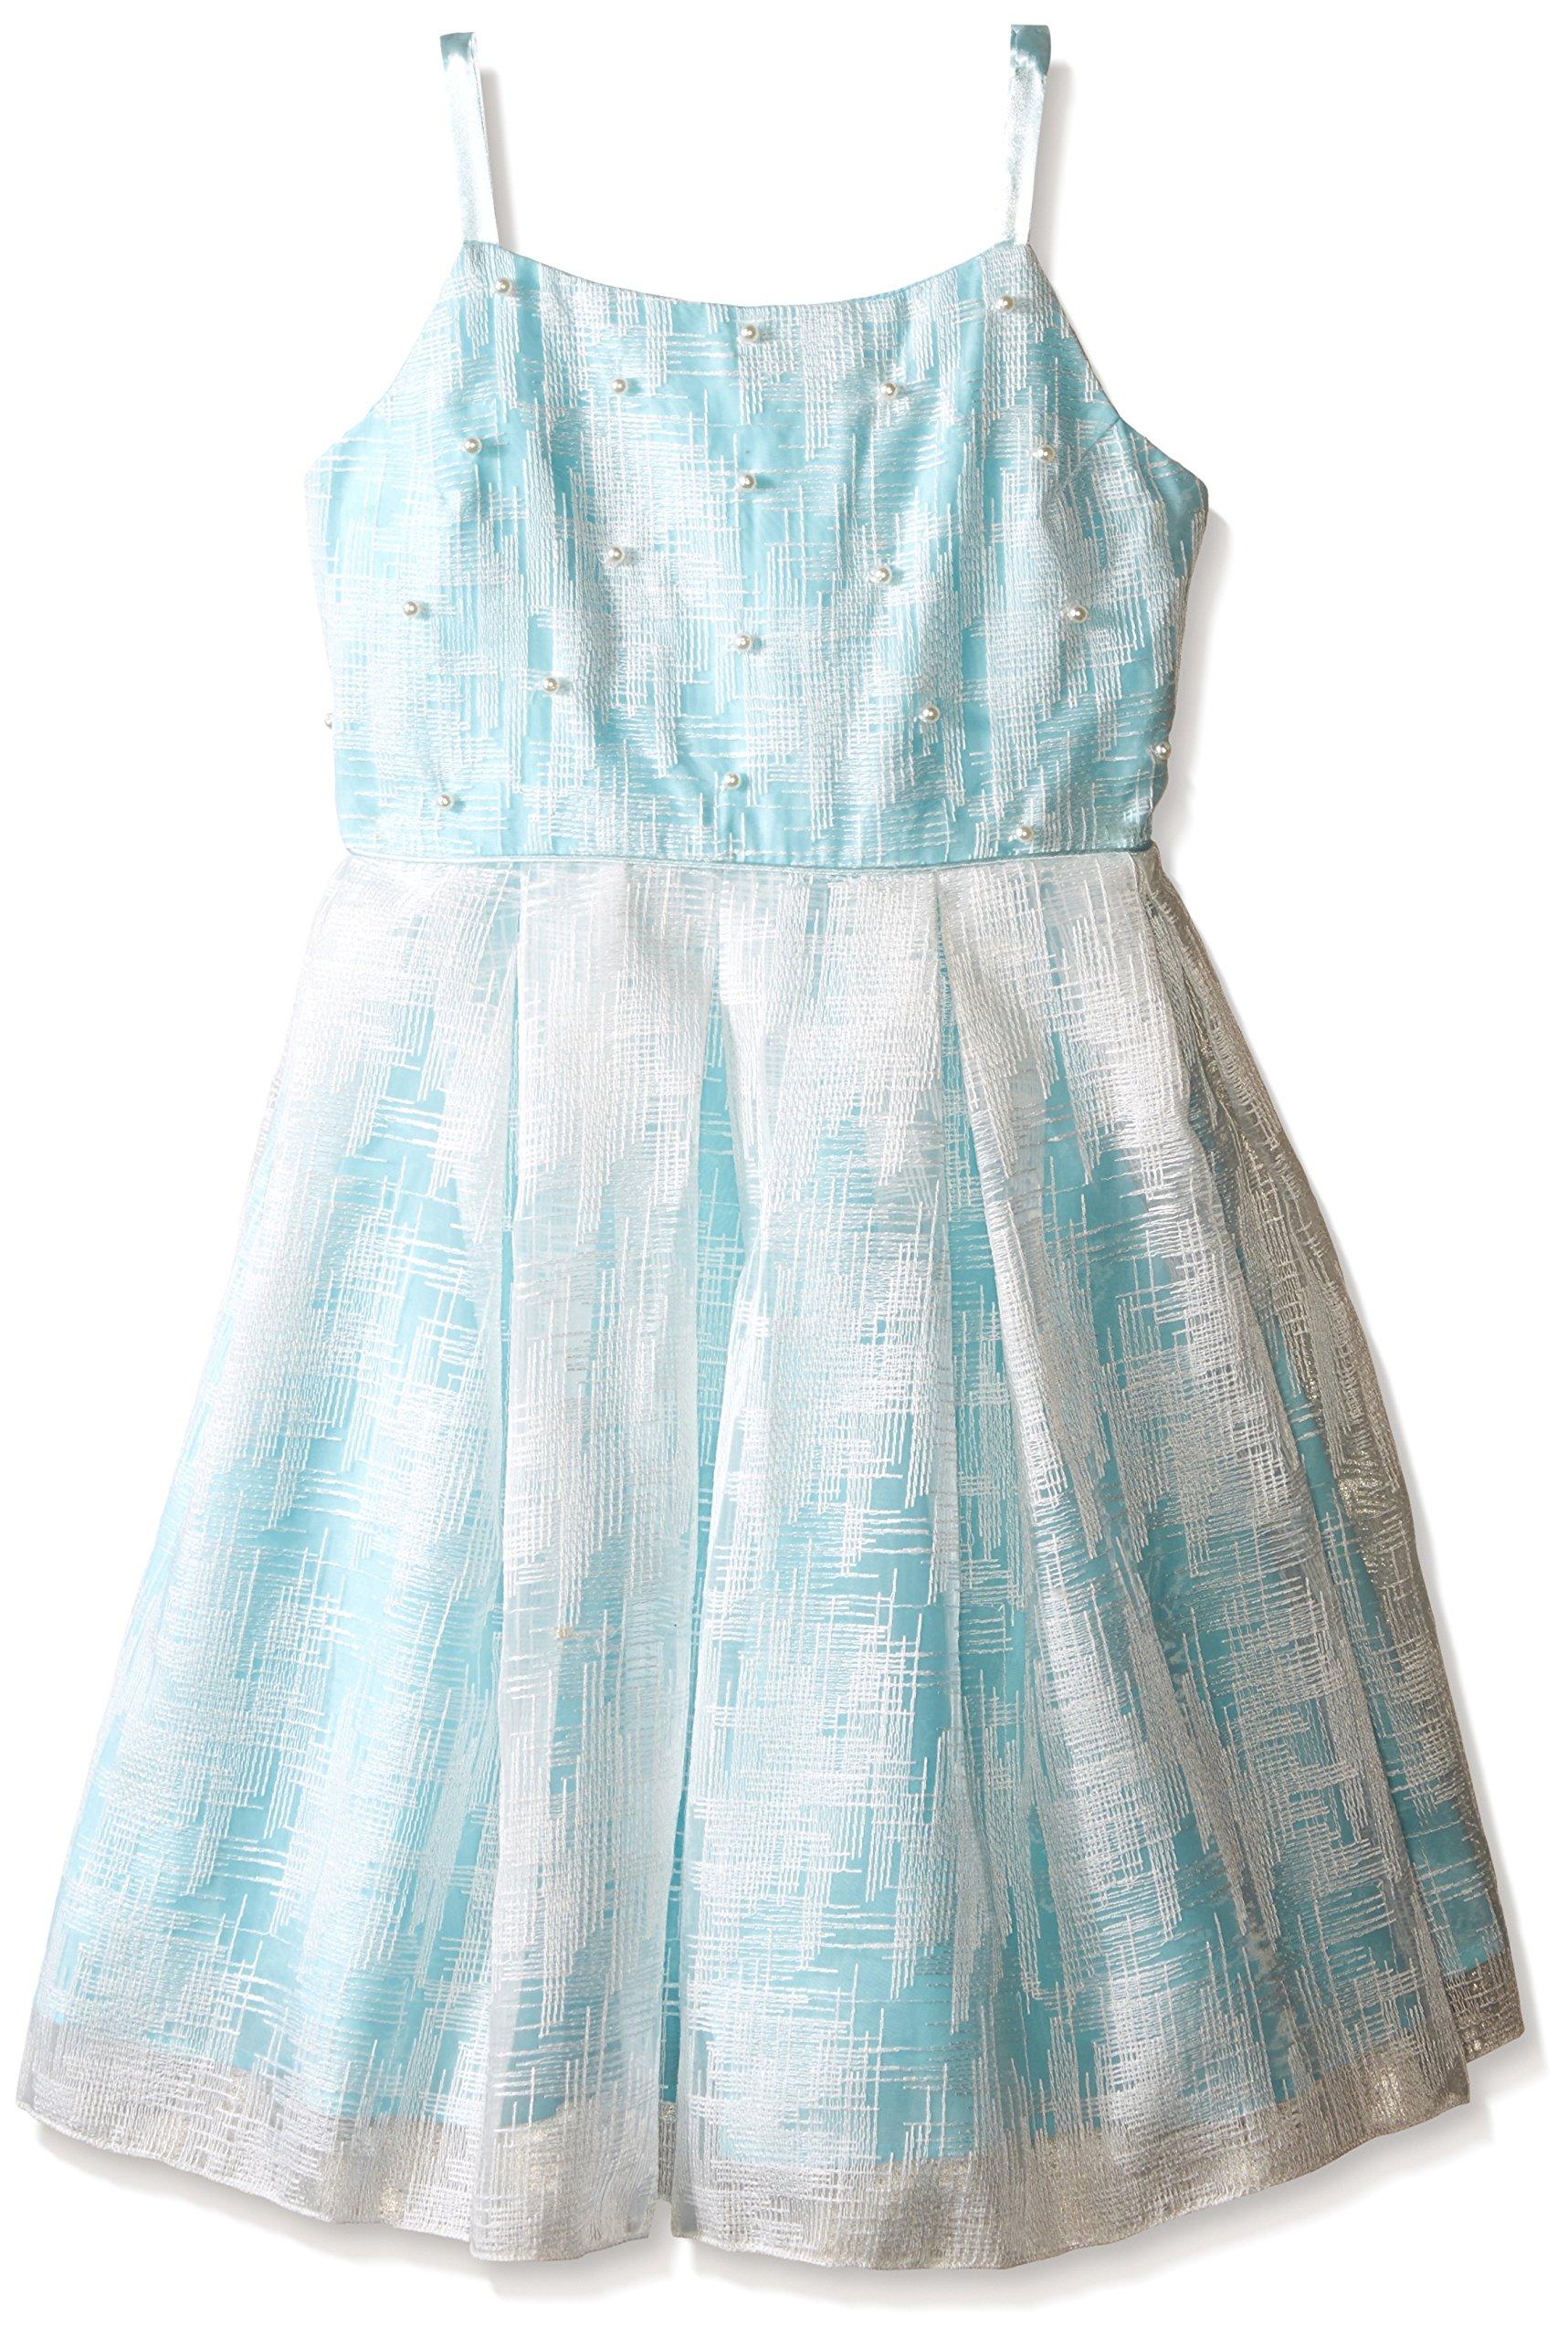 Biscotti Big Girls Tea Party Strappy Dress, Aqua, 7 by Biscotti (Image #1)